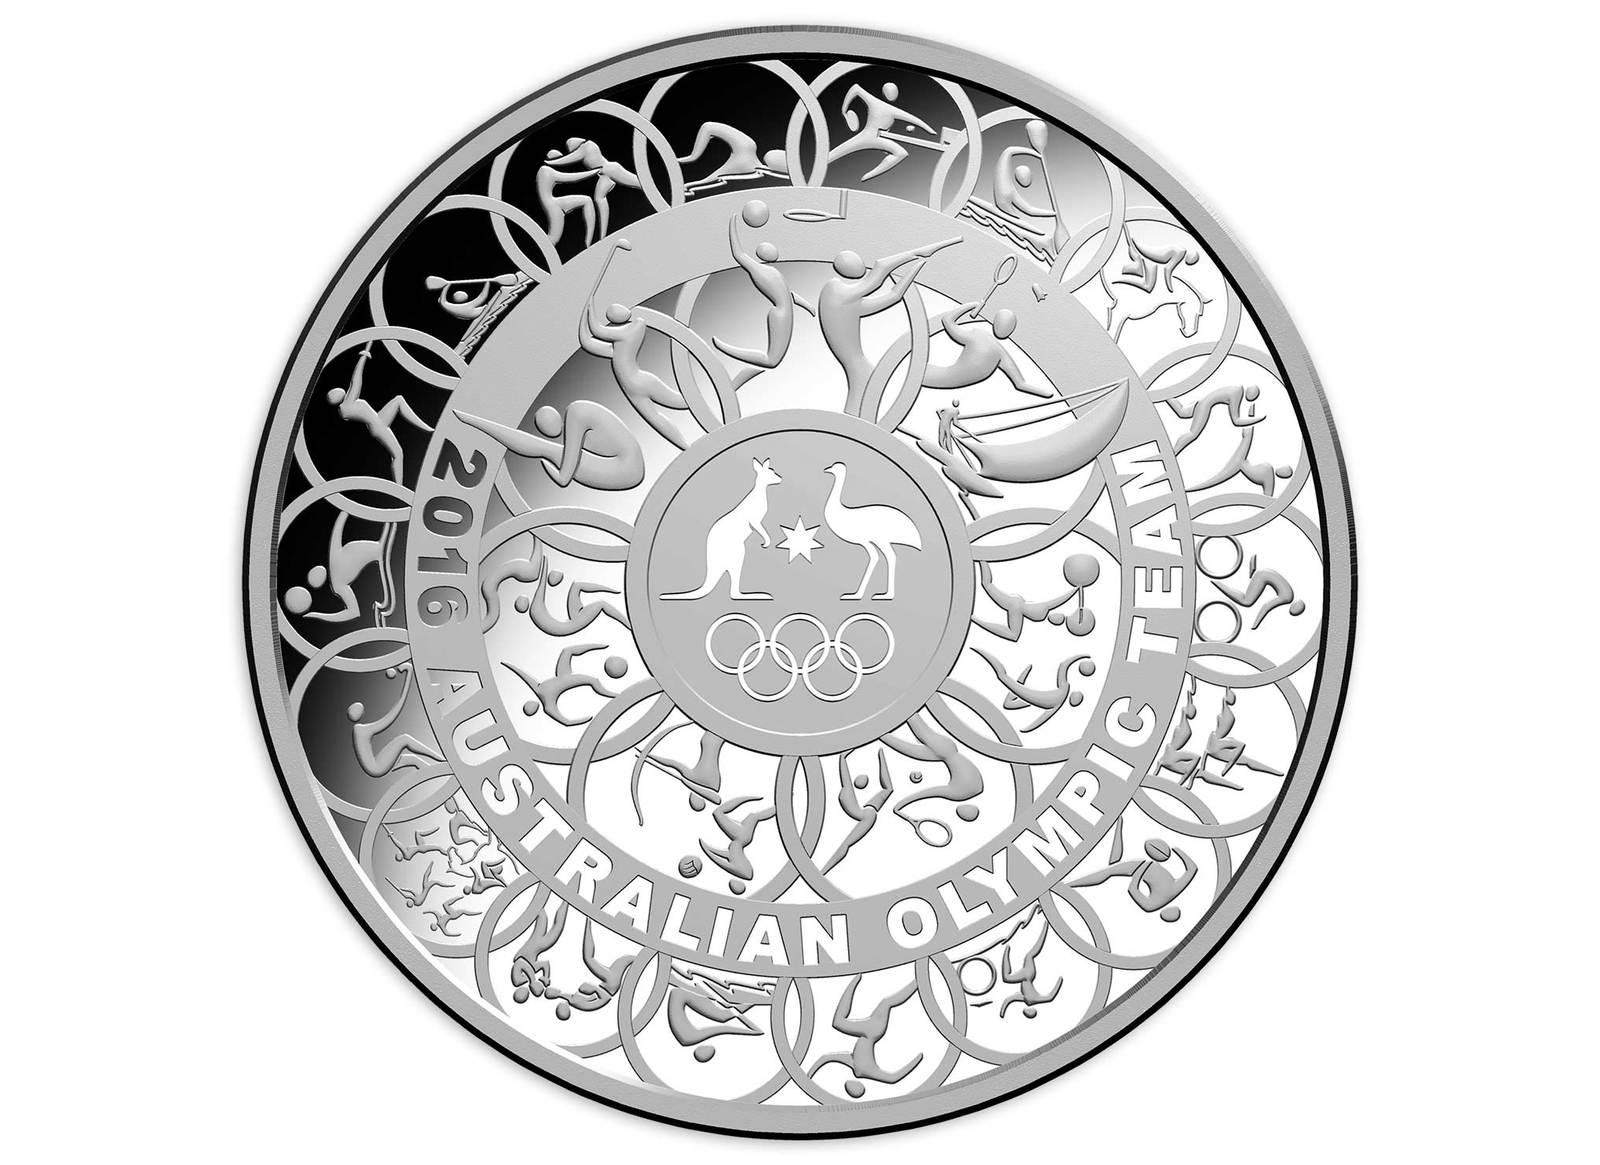 Coins Australia 2016 30 1kg Fine Silver Proof Coin